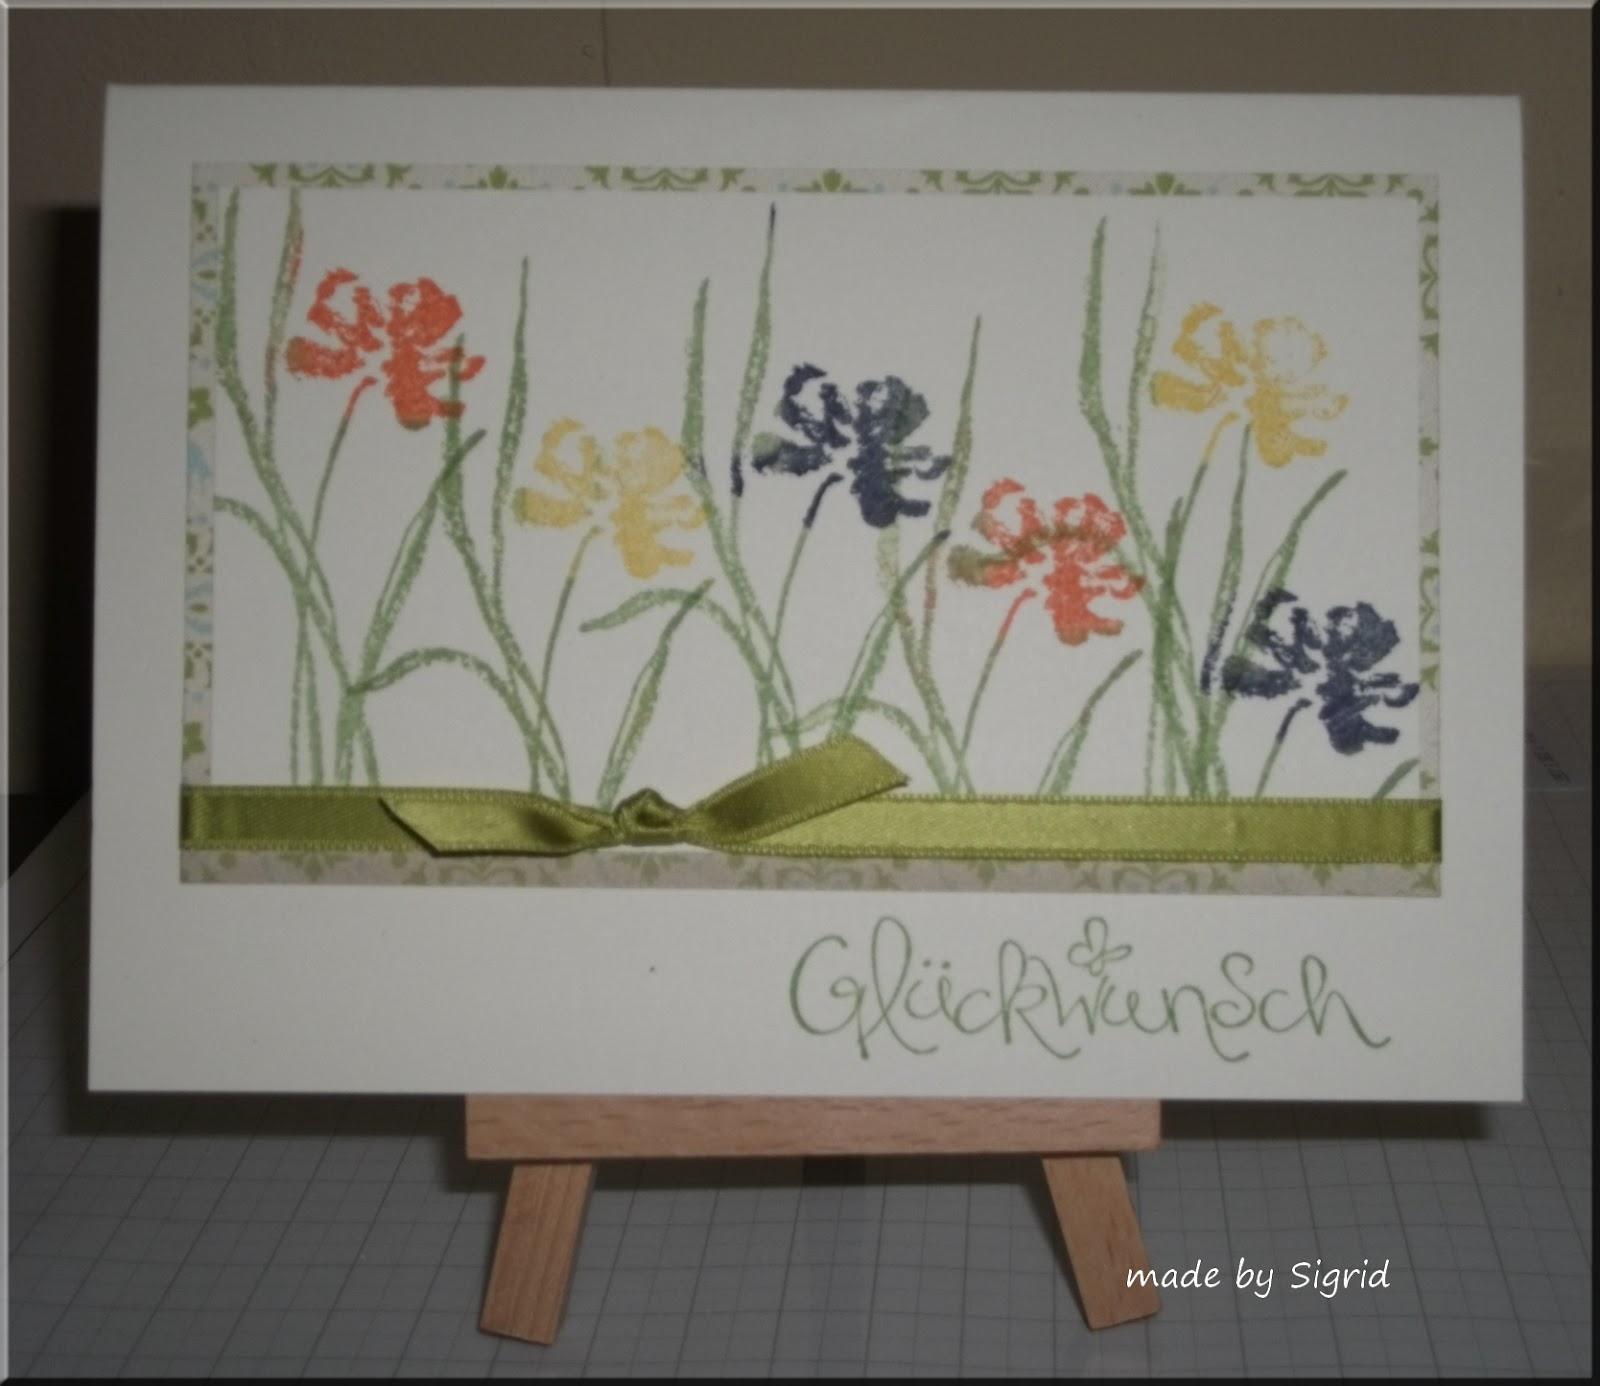 Sigrids kreative ART Stampin' Up! Ideenblog für Münster und Umgebung: Juni 2012